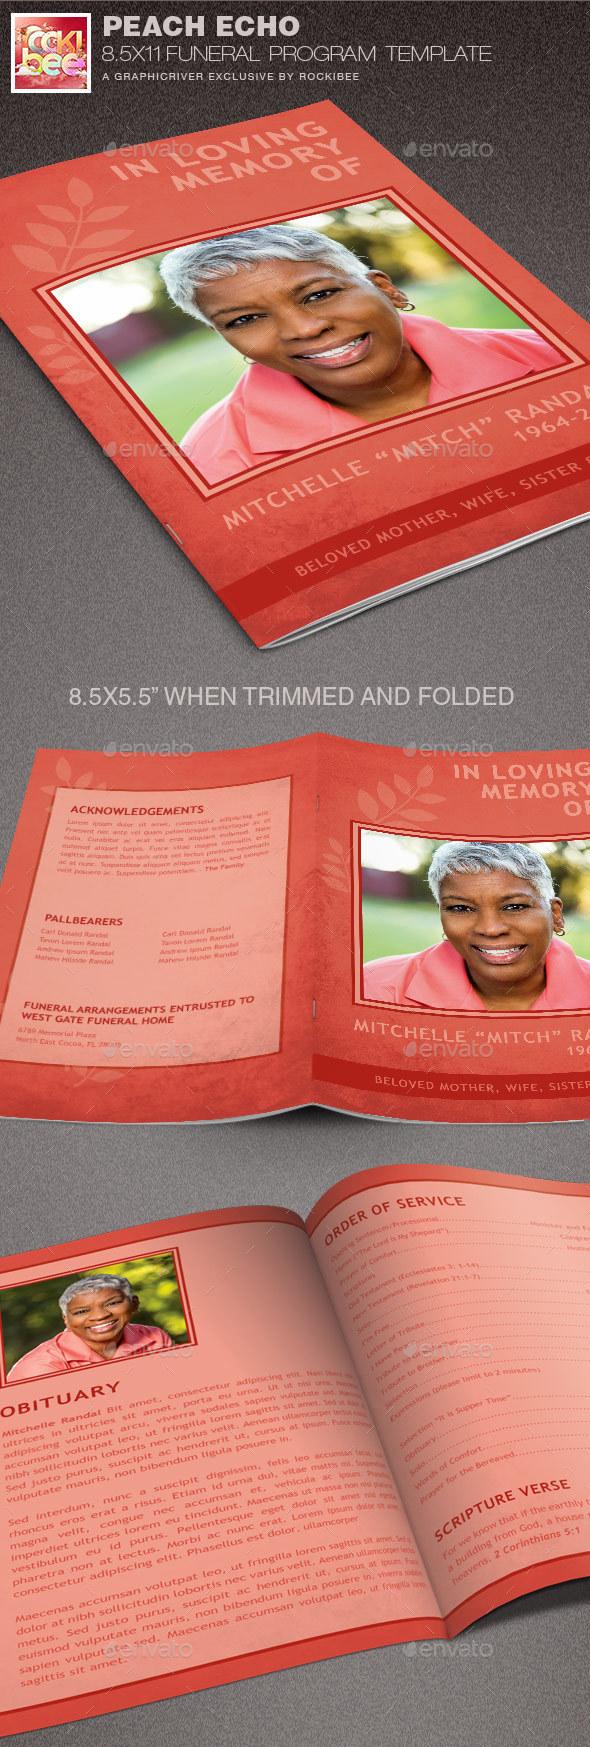 Peach Echo Funeral Program Template - Informational Brochures